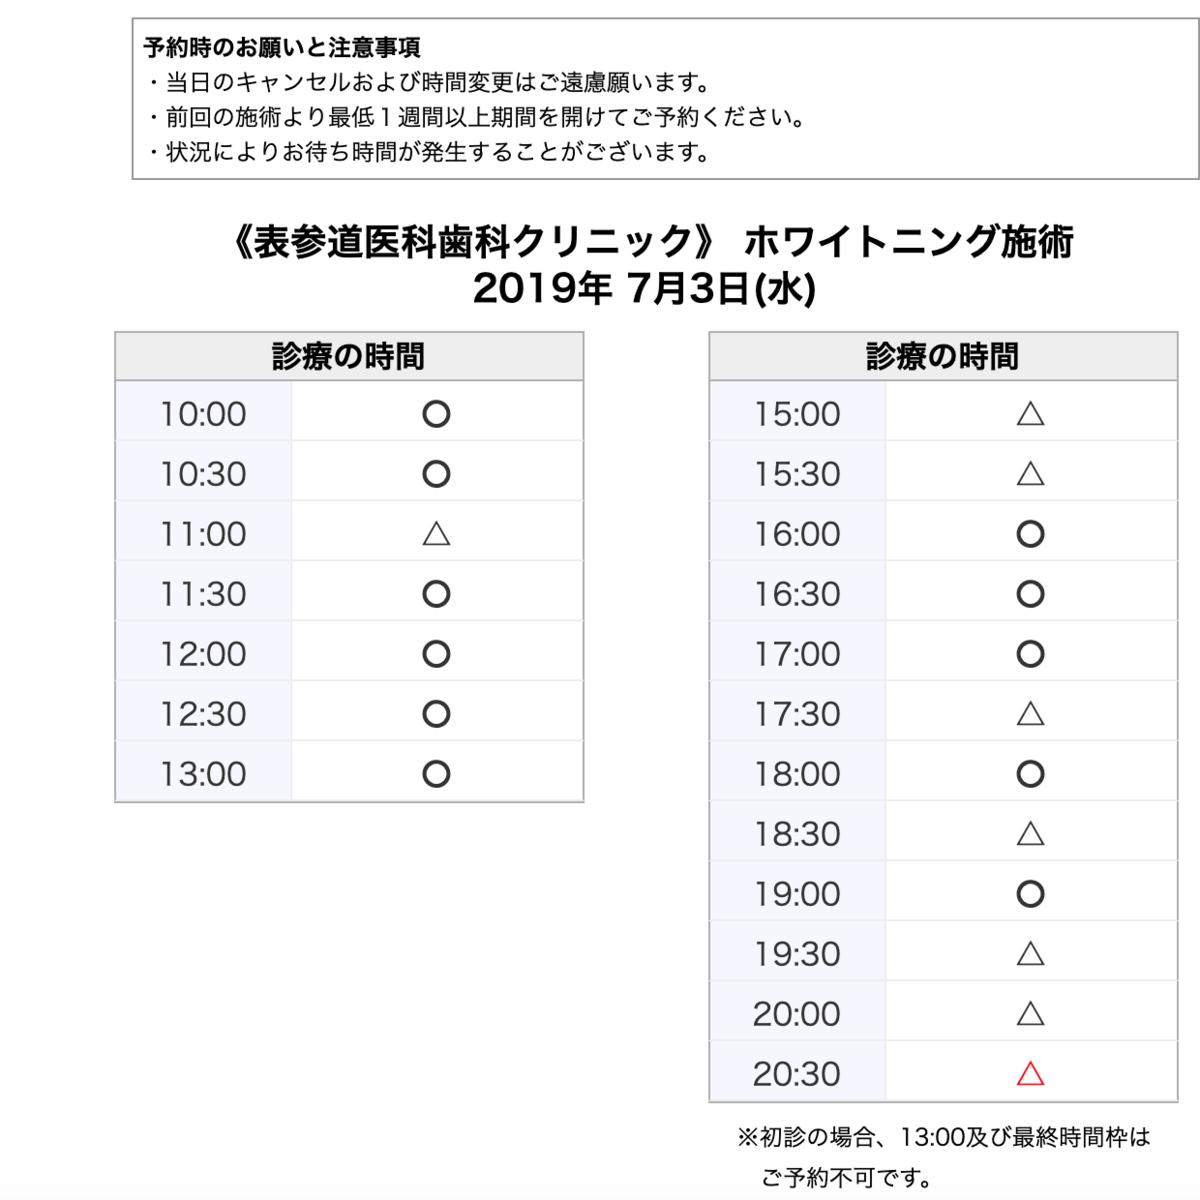 f:id:hideyoshi1537:20190630094017p:plain